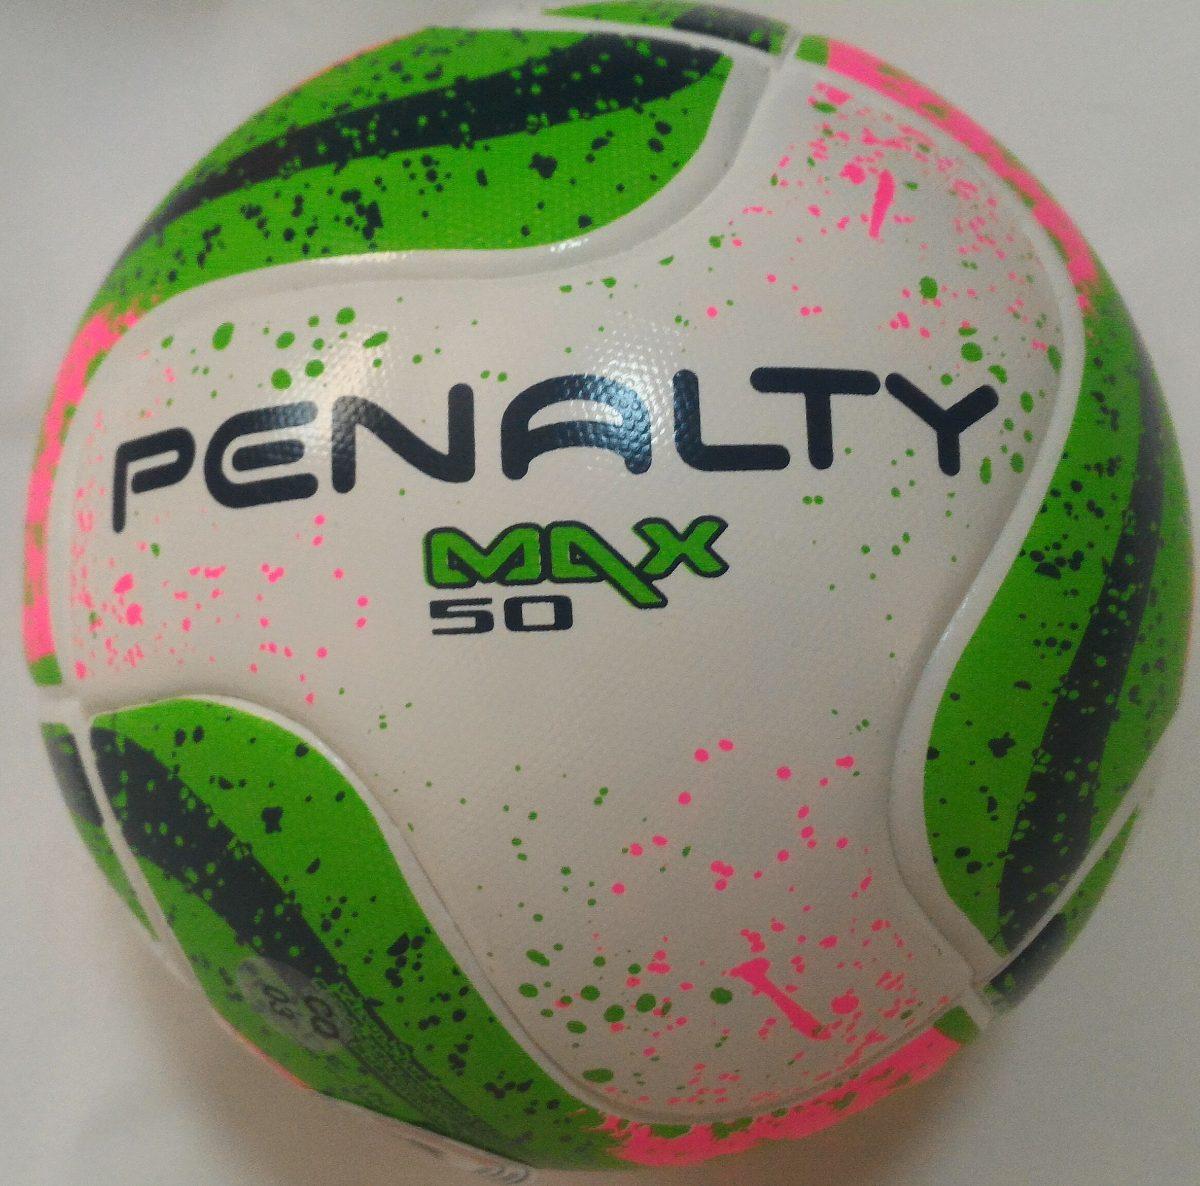 bola futsal penalty max 50 termotec oficial fifa. Carregando zoom. 2a16ddde8dbbf